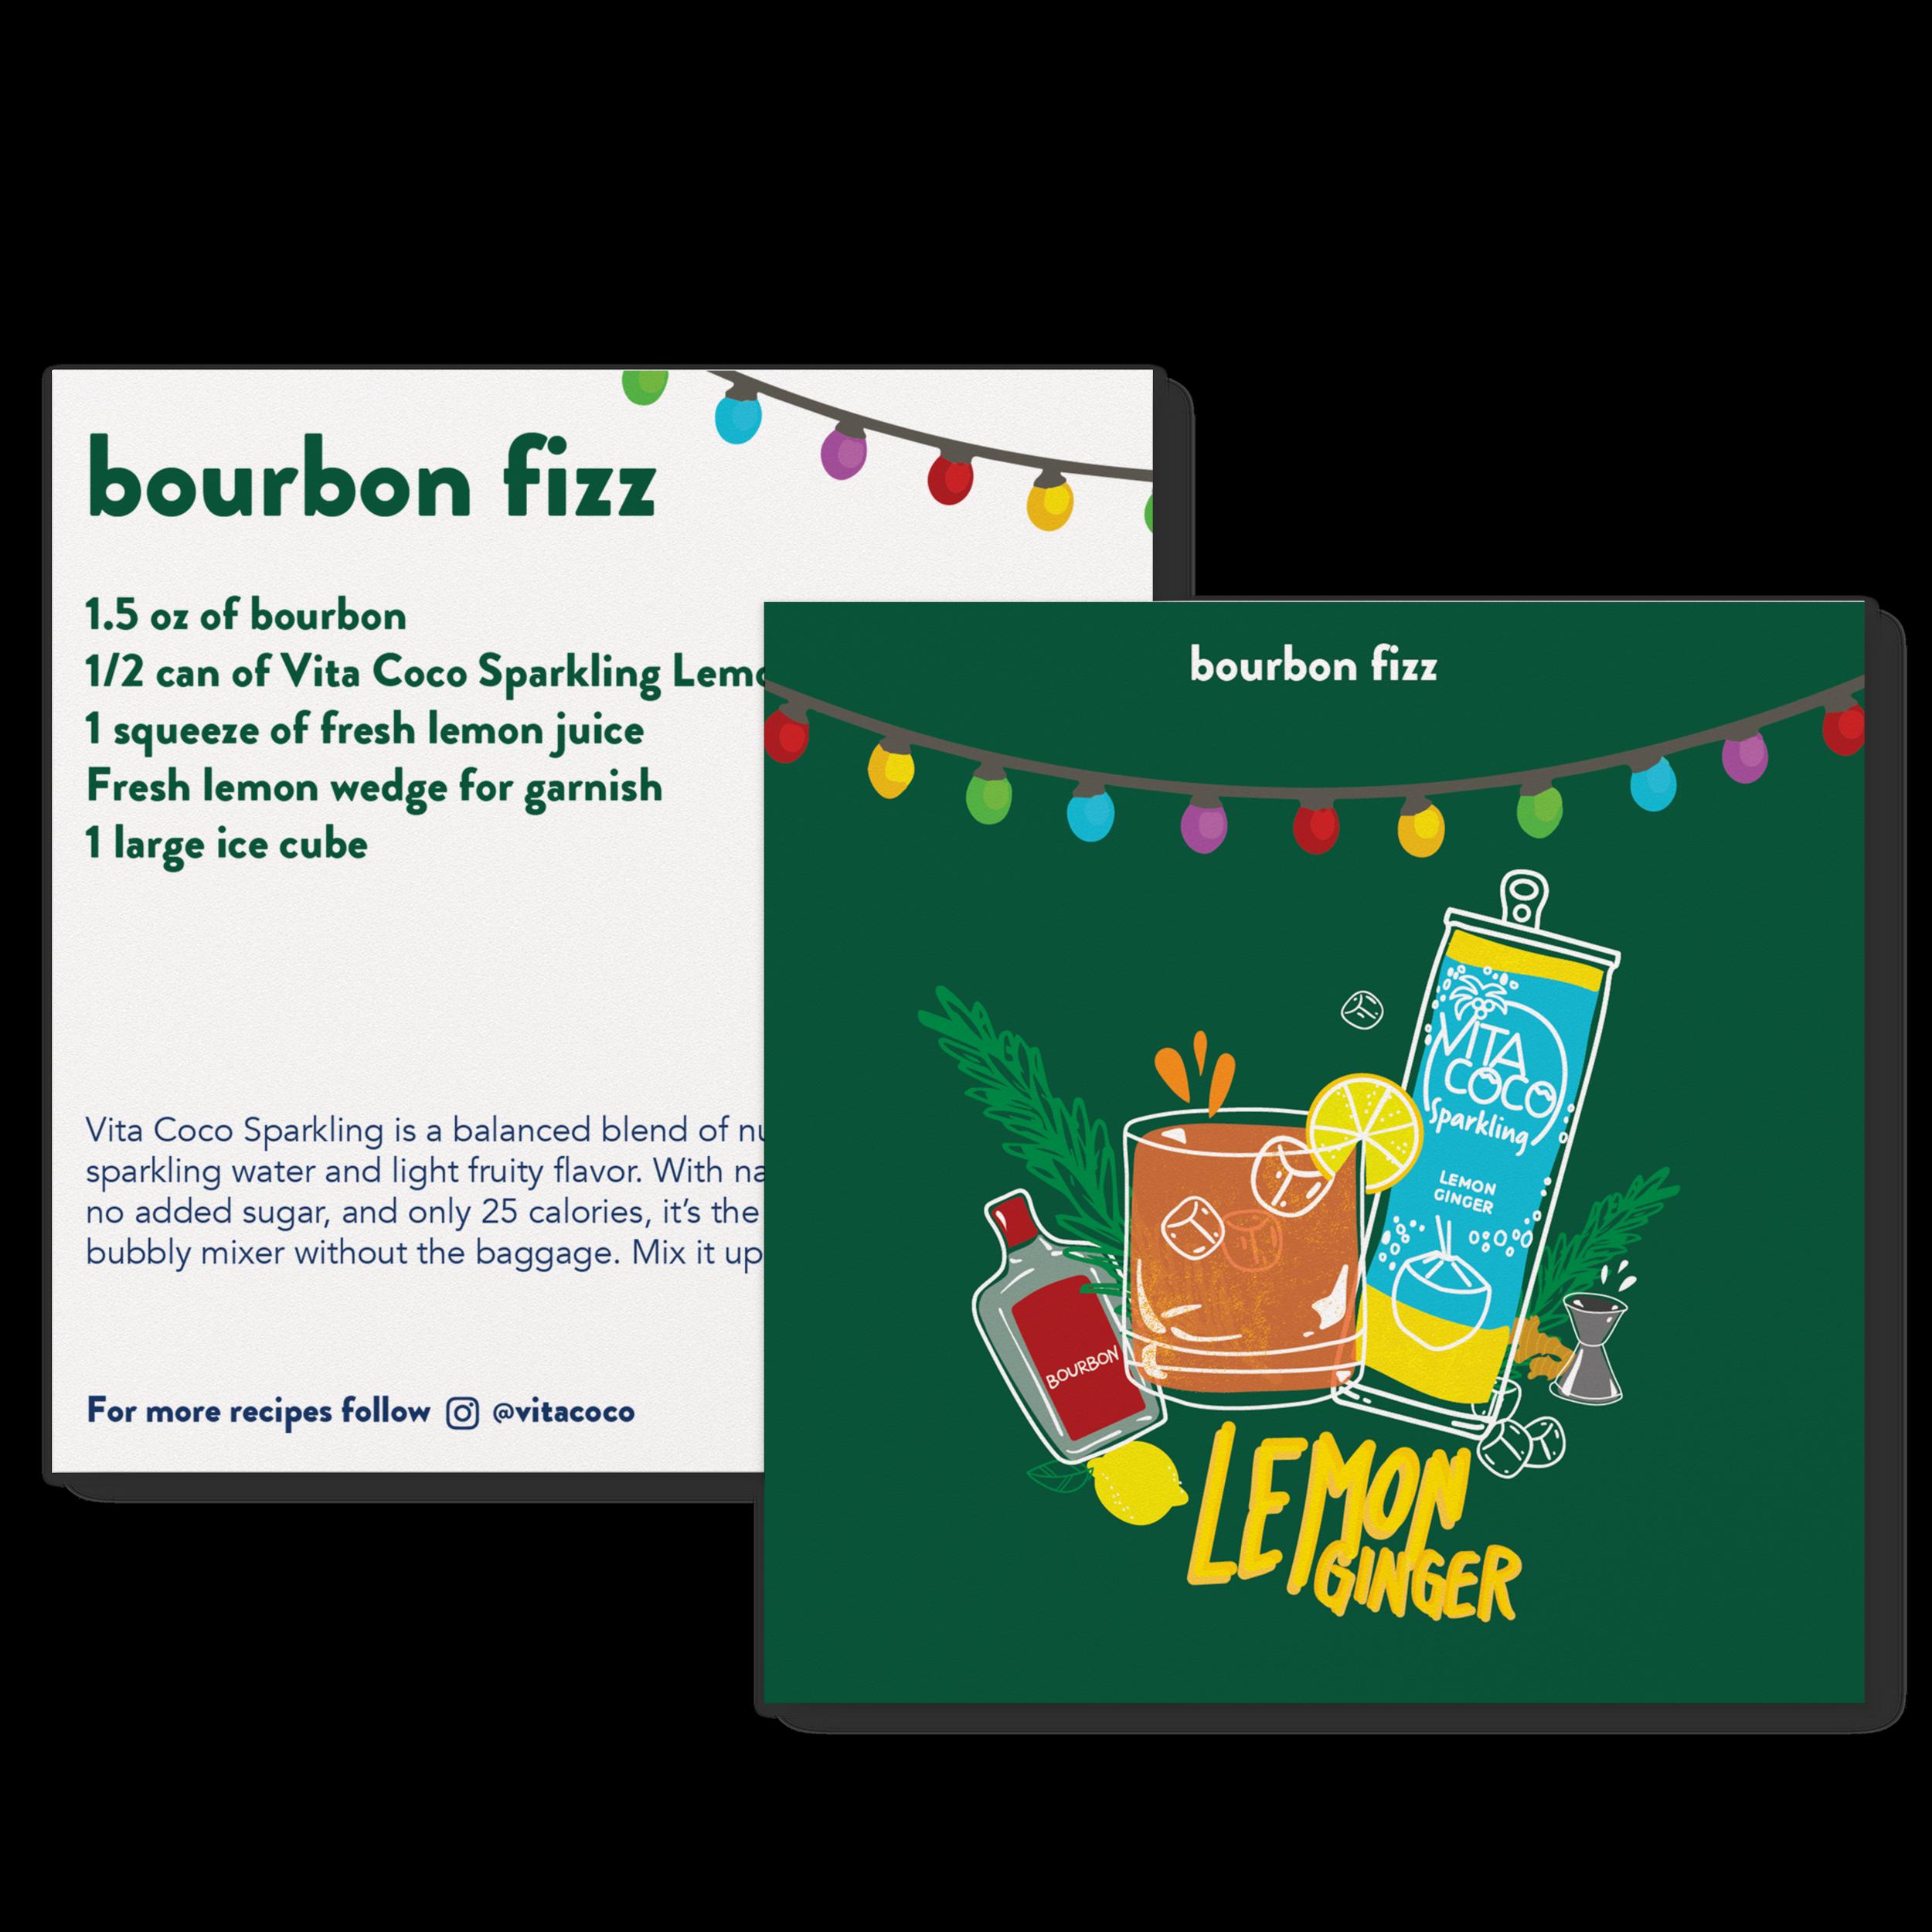 holiday recipe card bourbonfizz mockups.png